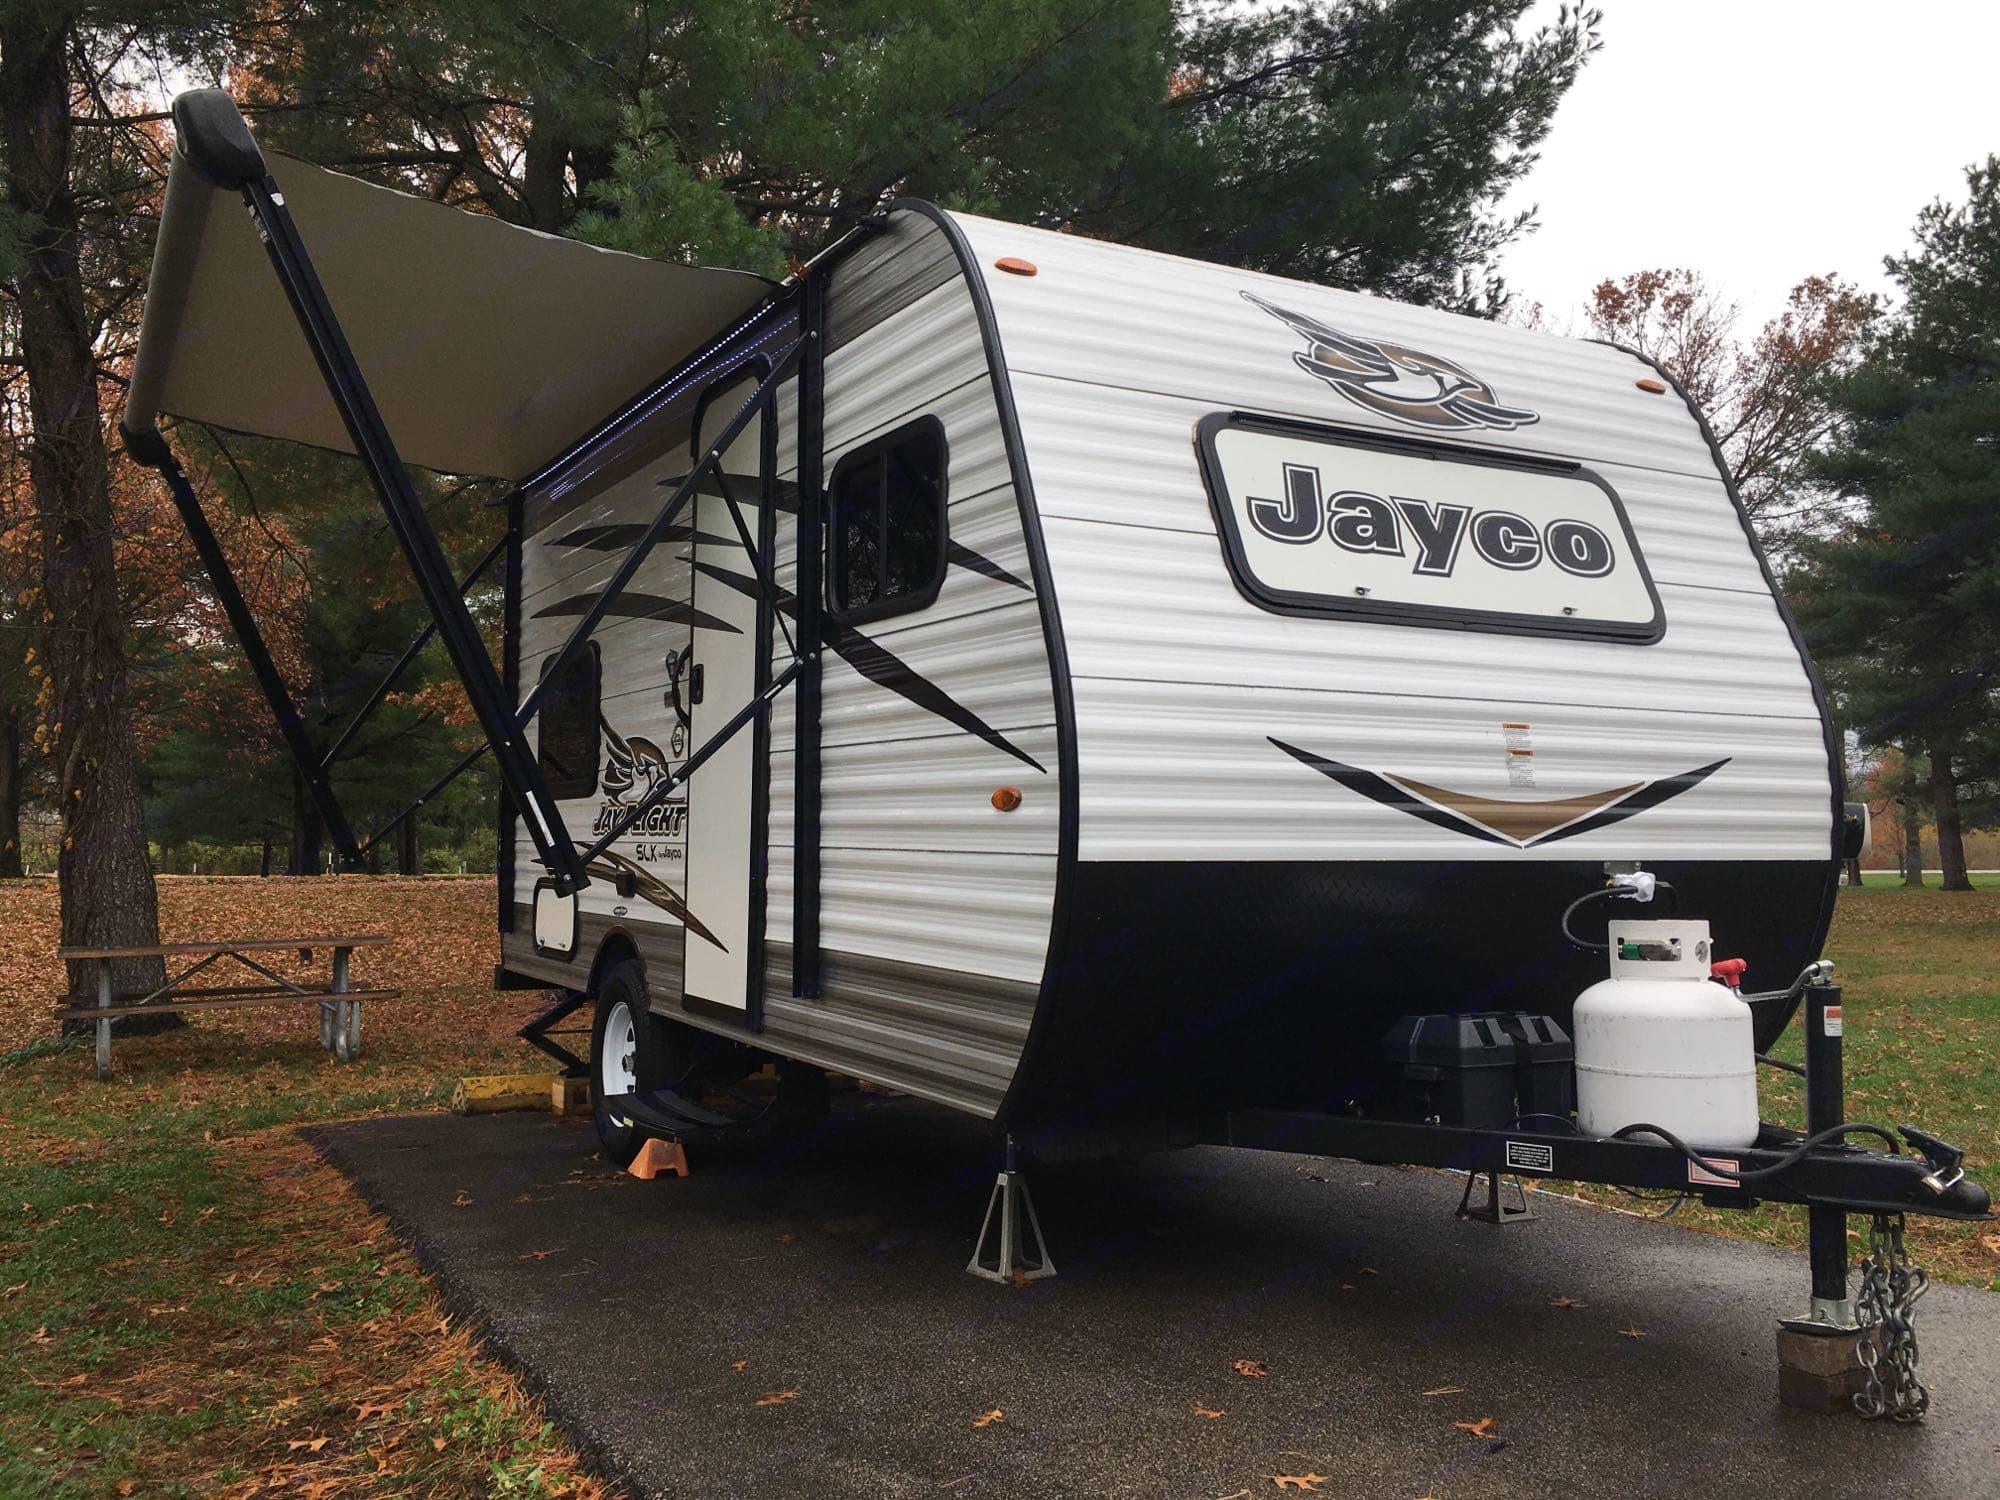 In her natural habitat. Jayco JayFlight 2018